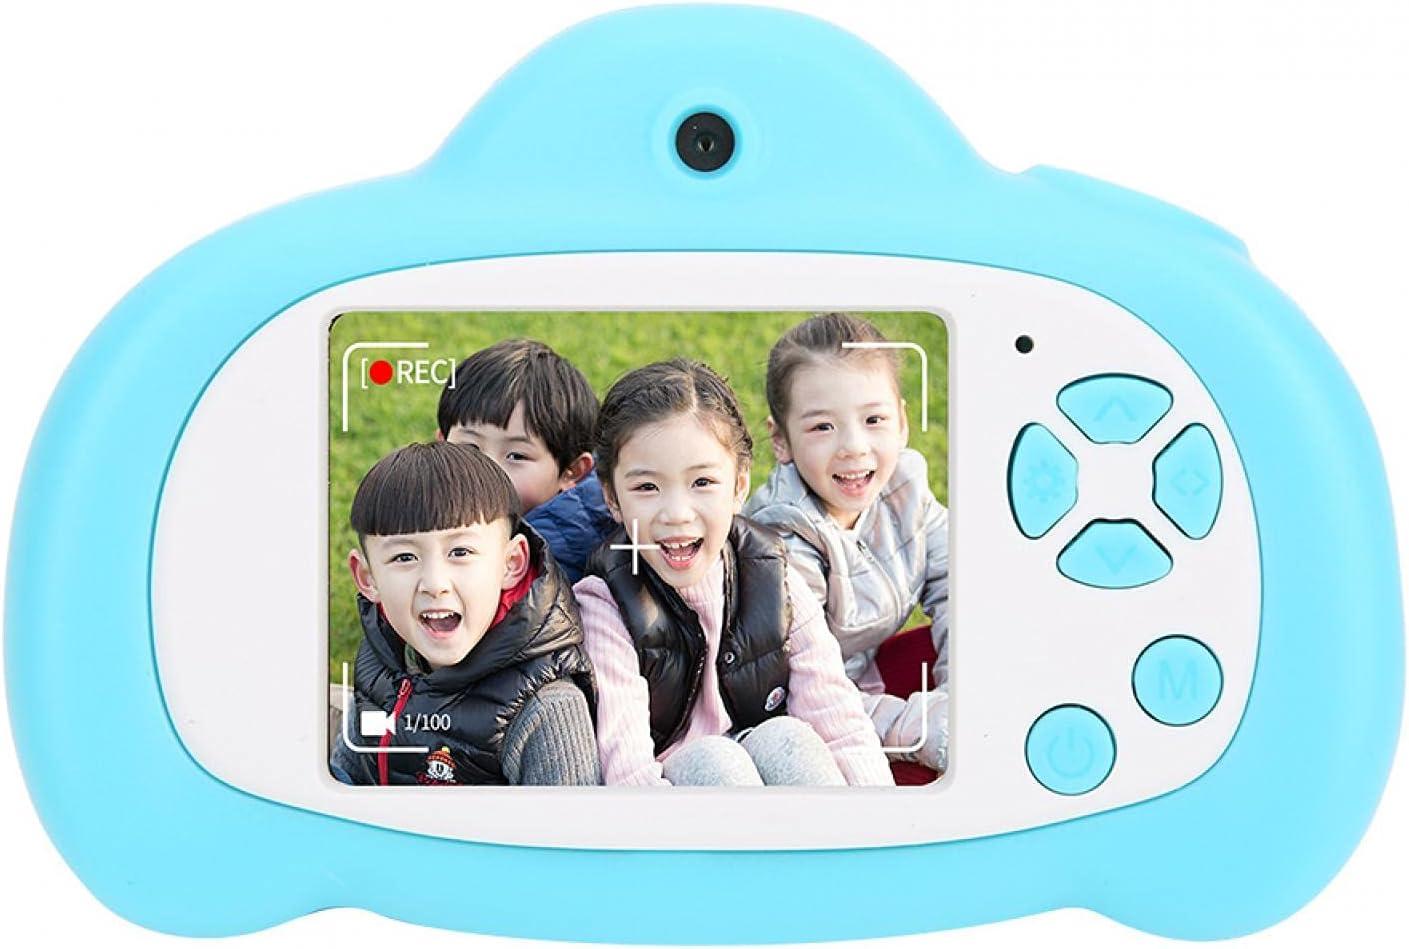 Kids Selfie Camera Jacksonville Mall Inexpensive 1080P Camer Compact Cameras